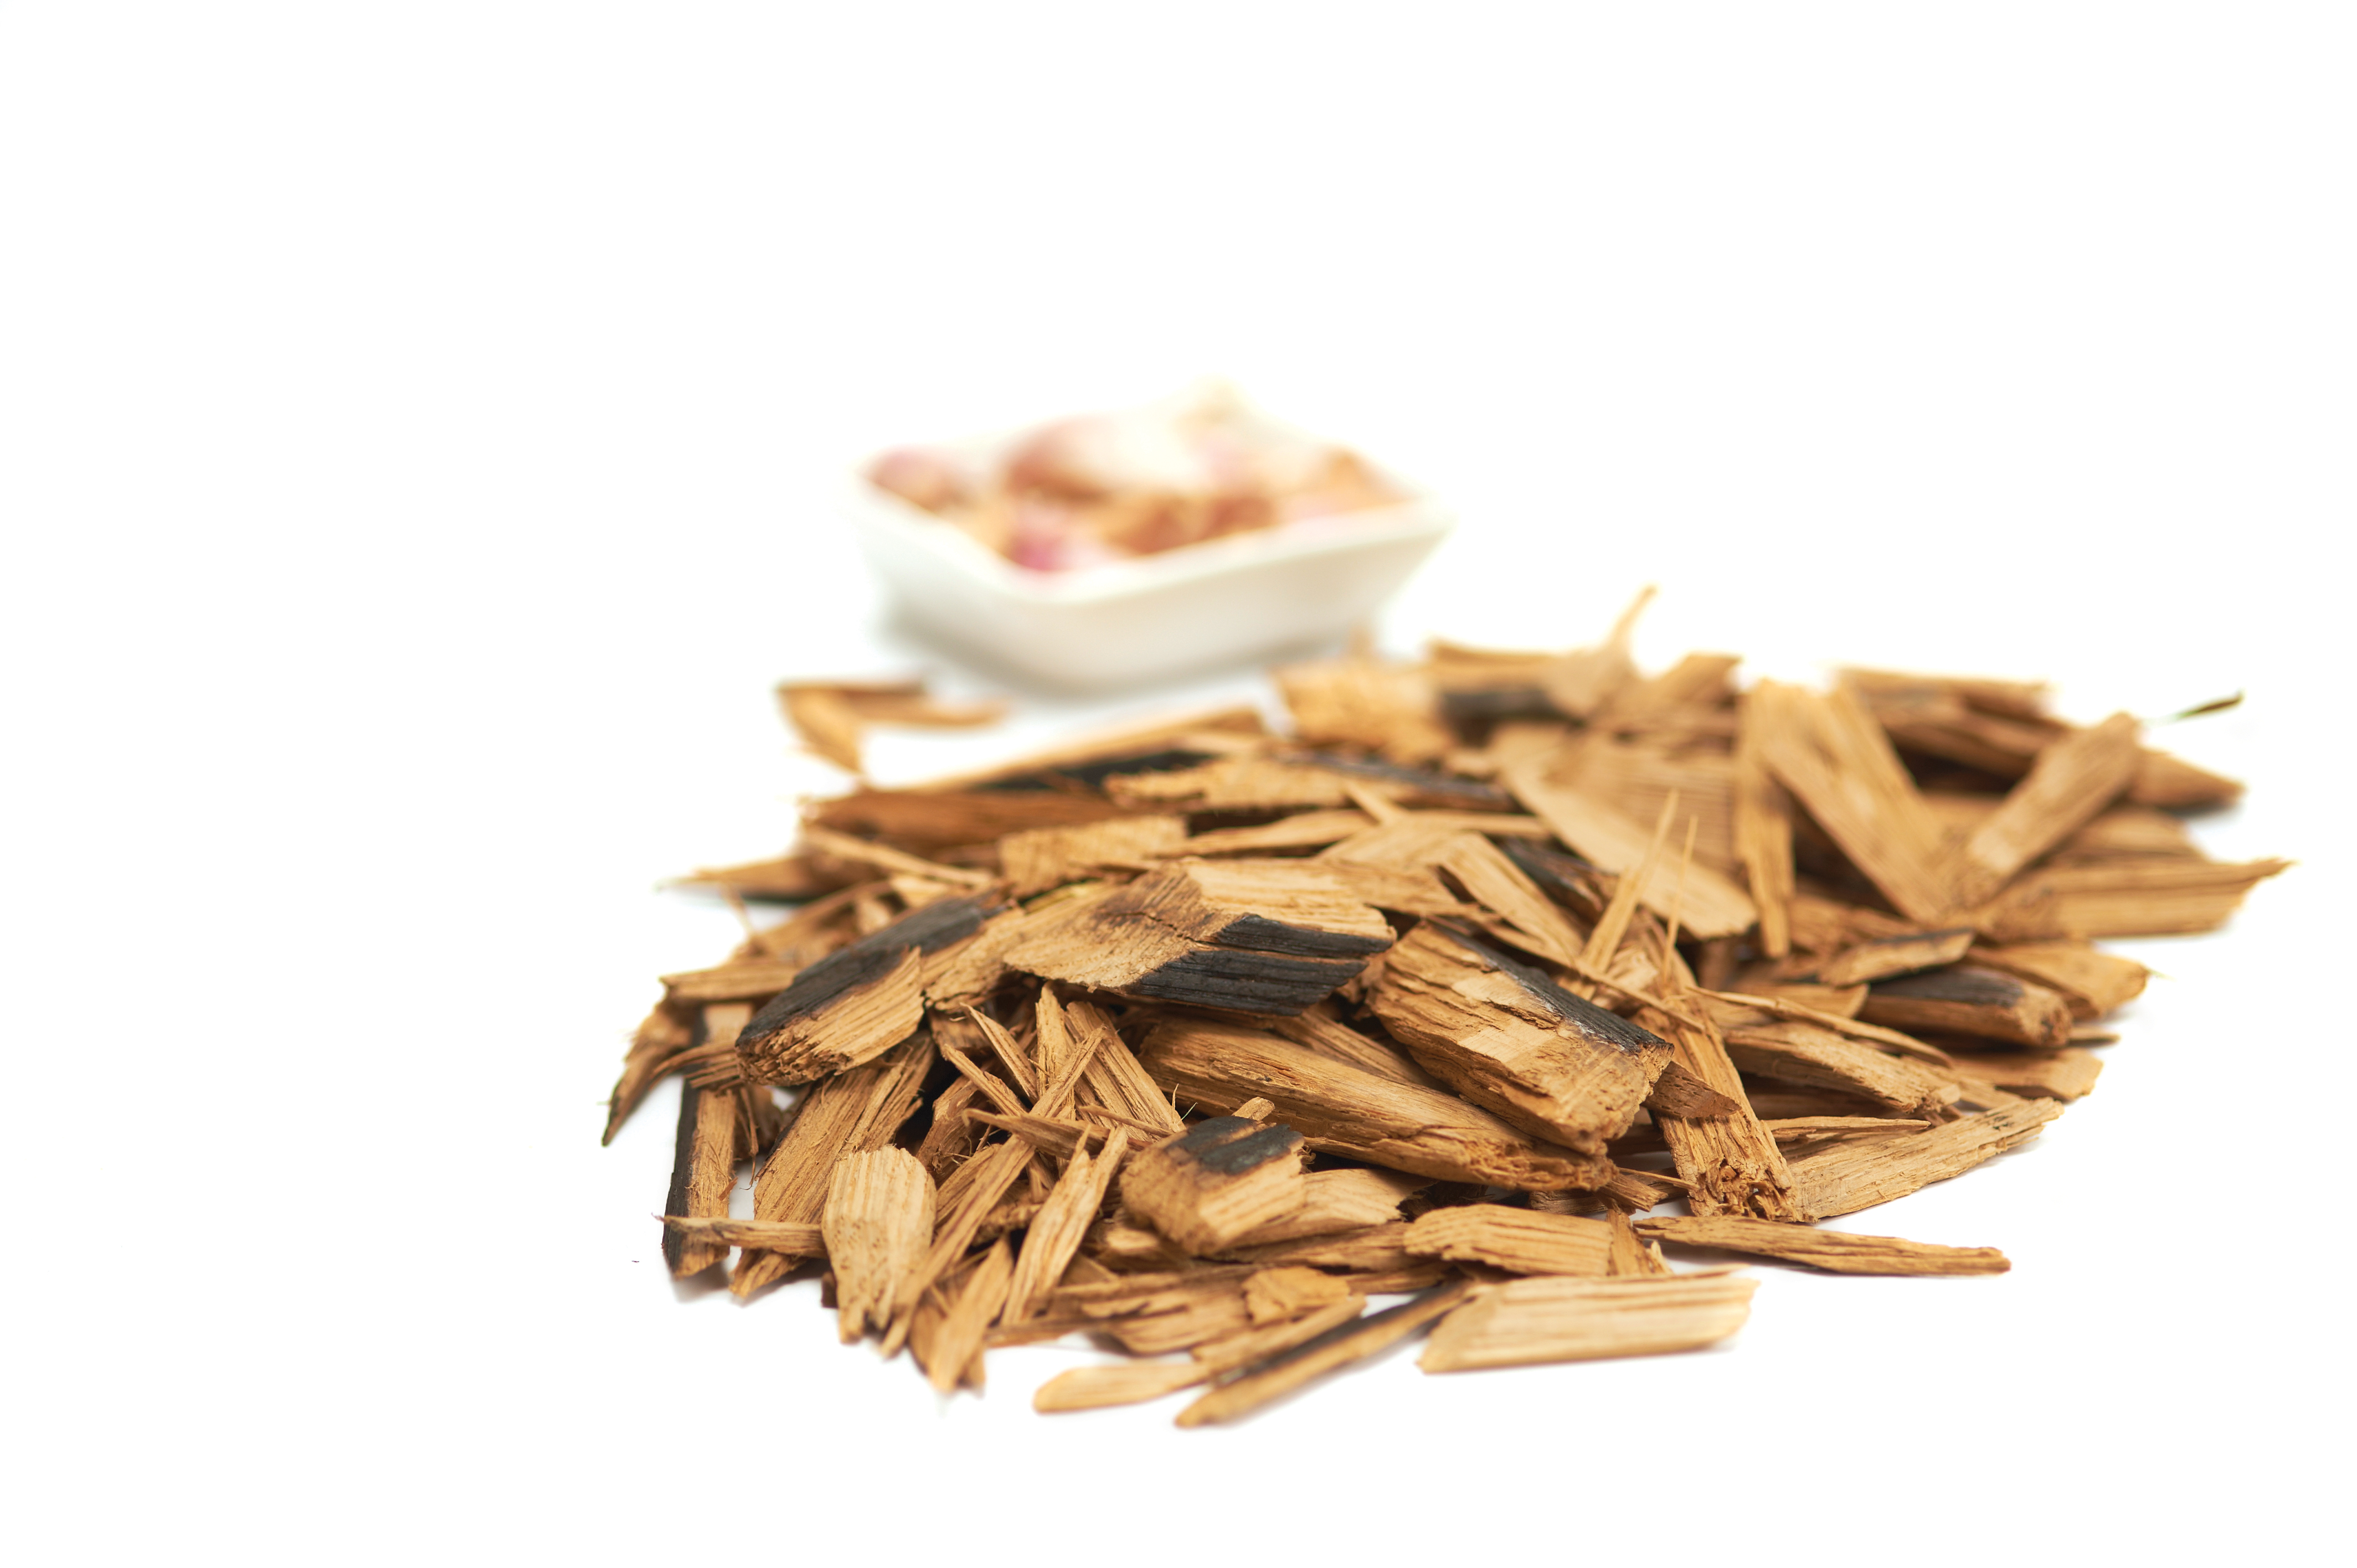 r ucher chips kaufen wunderbares aroma durch woodchips. Black Bedroom Furniture Sets. Home Design Ideas